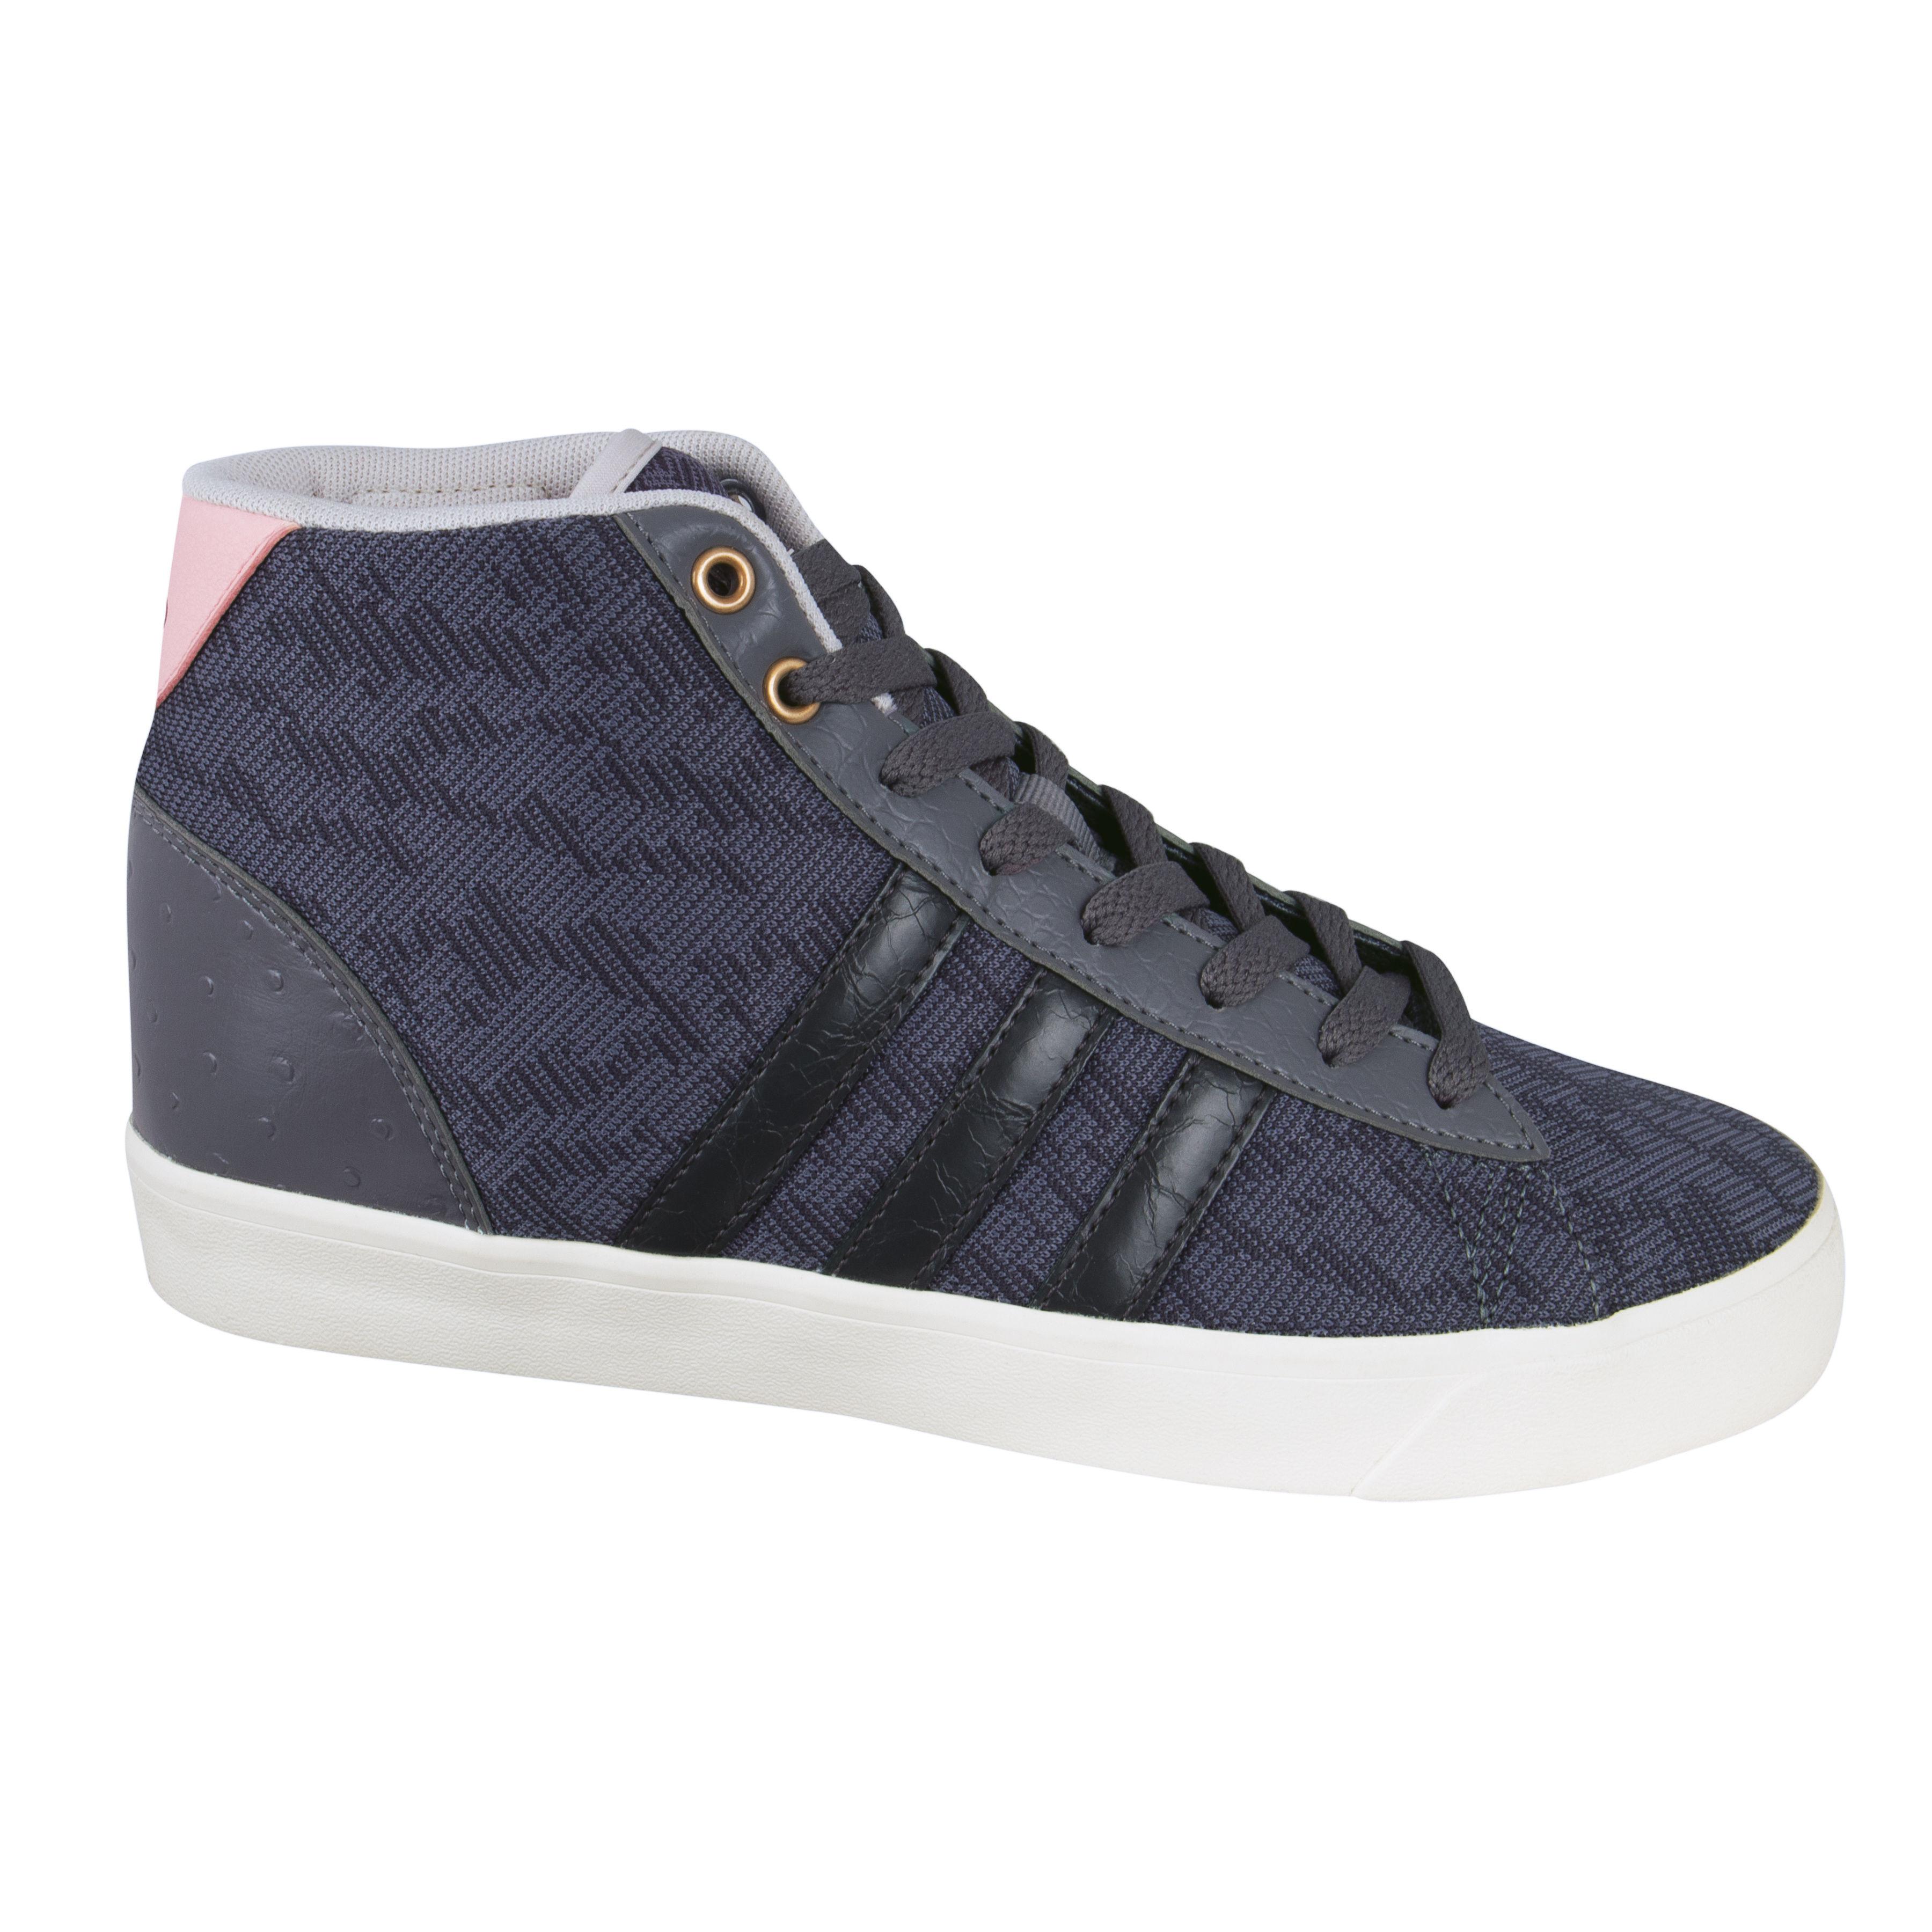 ADIDAS CLOUDFOAM DAILY QT Mid Damen Sneaker